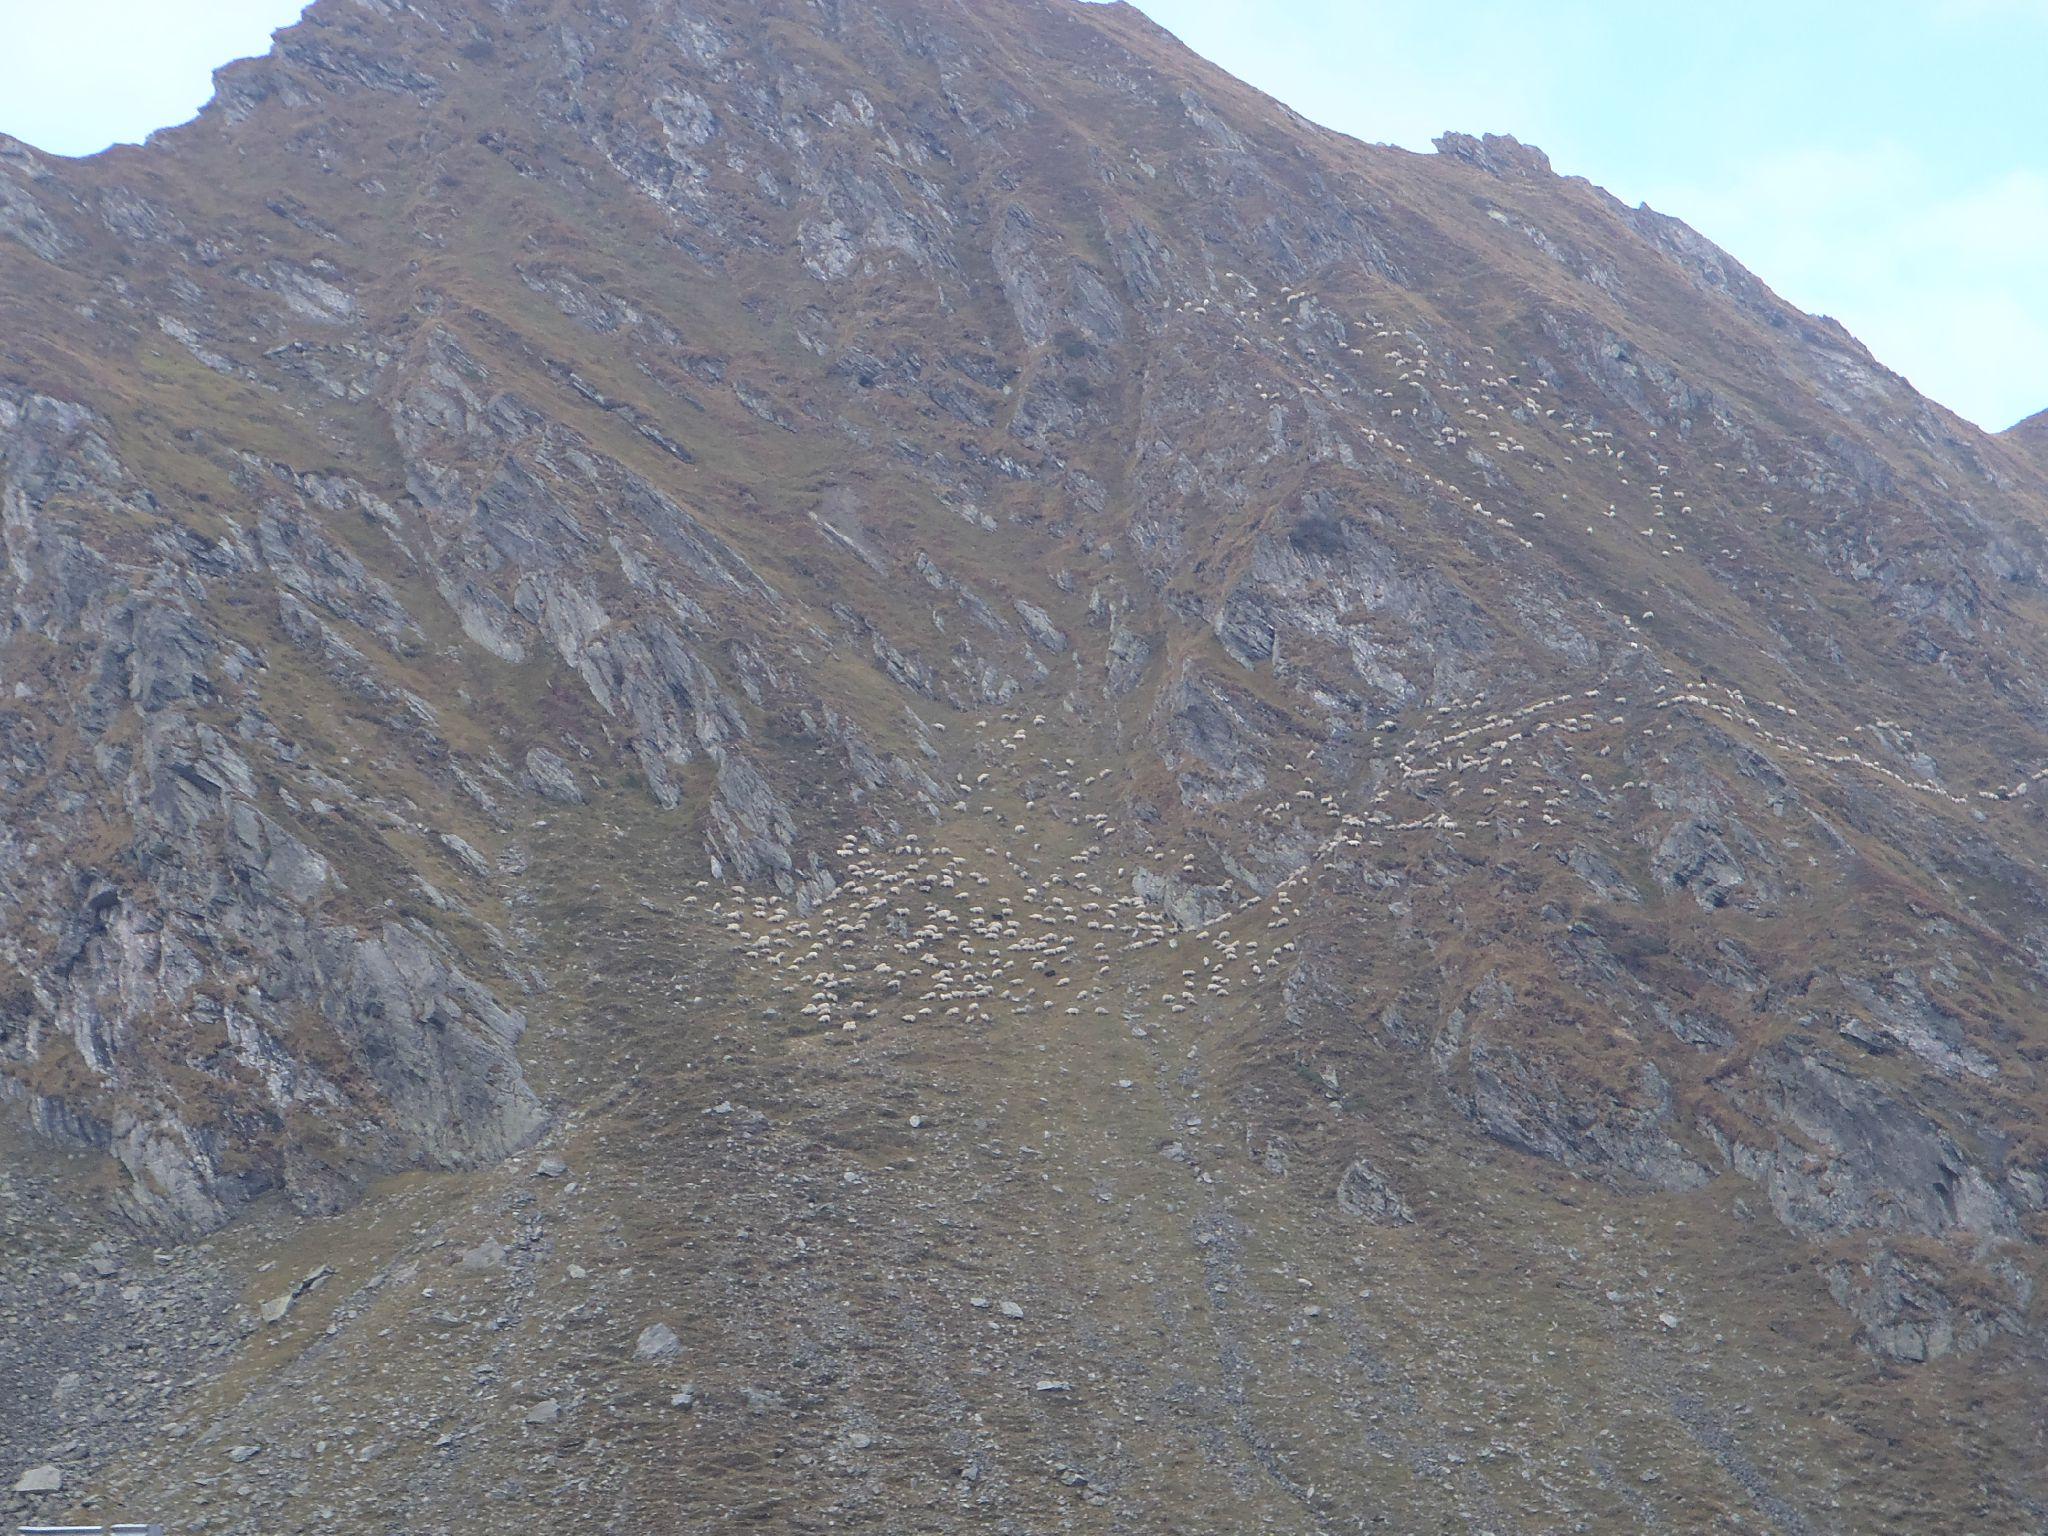 roumanie - transfagarasan troupeaux de moutons-dahuts